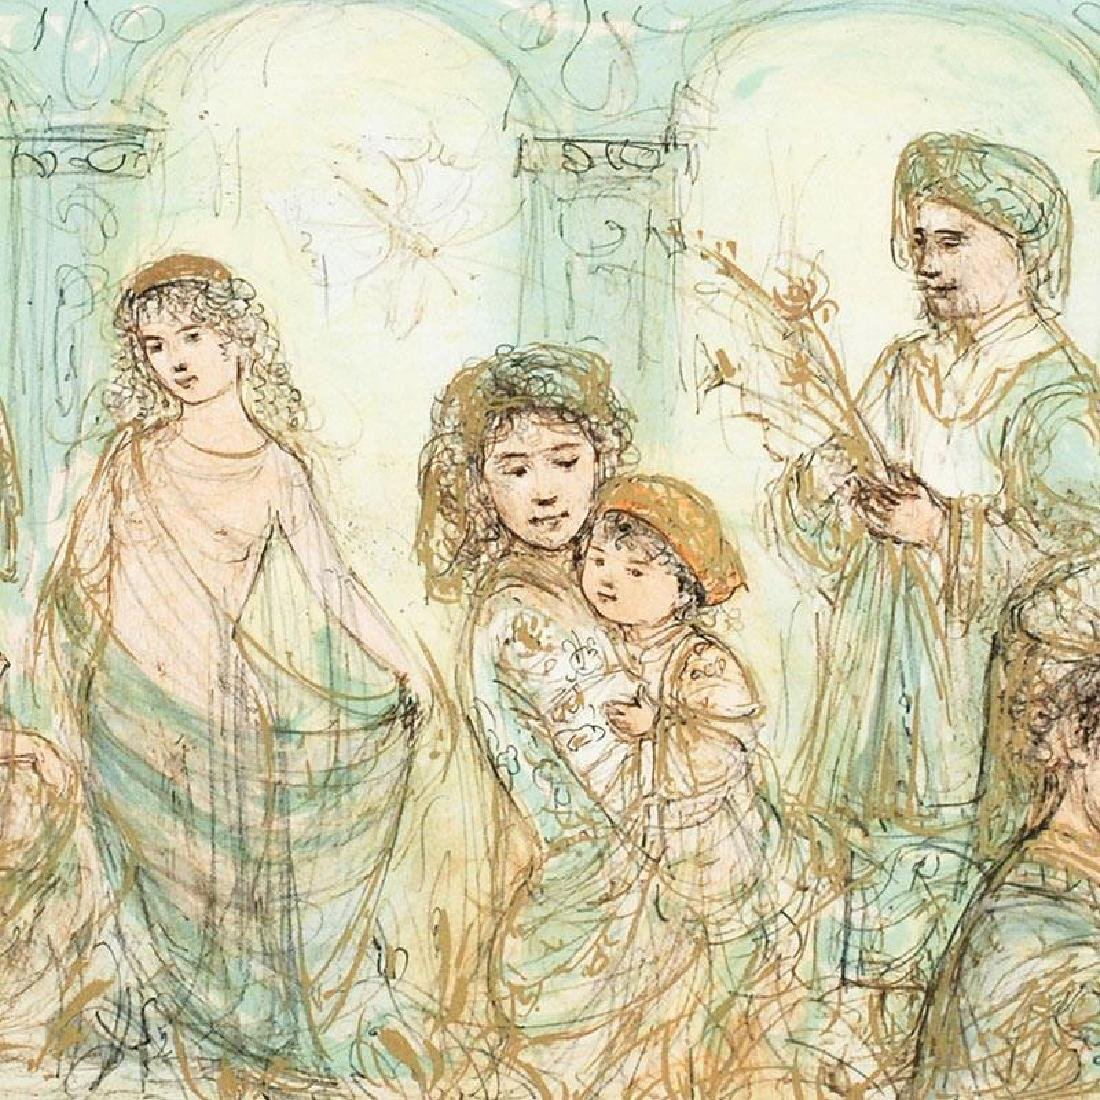 Solomon's Court by Hibel (1917-2014) - 2